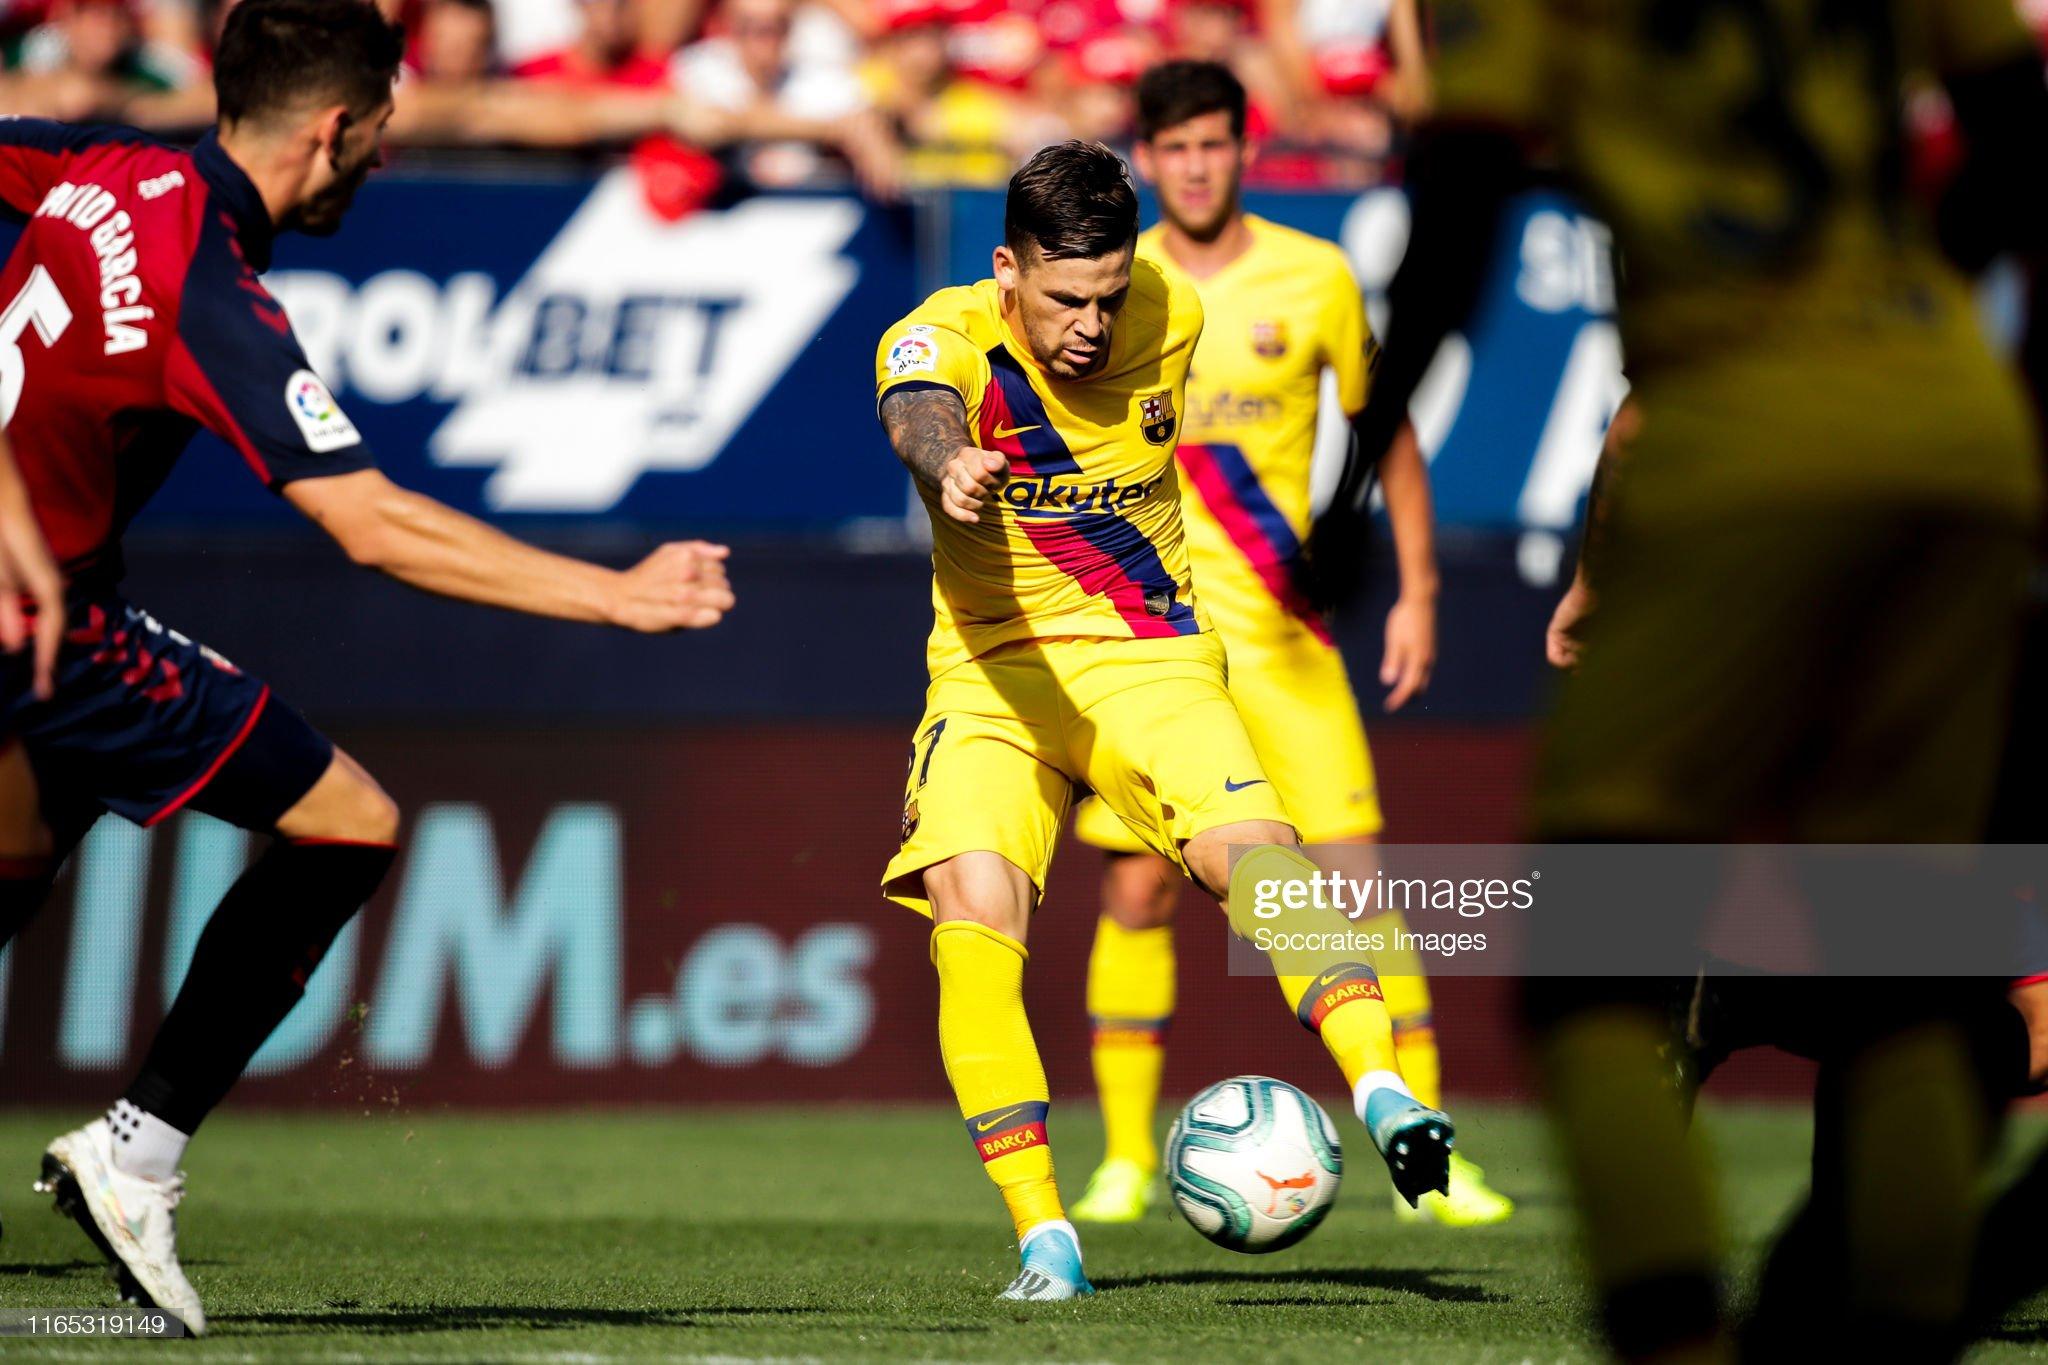 صور مباراة : أوساسونا - برشلونة 2-2 ( 31-08-2019 )  Carles-perez-of-fc-barcelona-during-the-la-liga-santander-match-v-picture-id1165319149?s=2048x2048